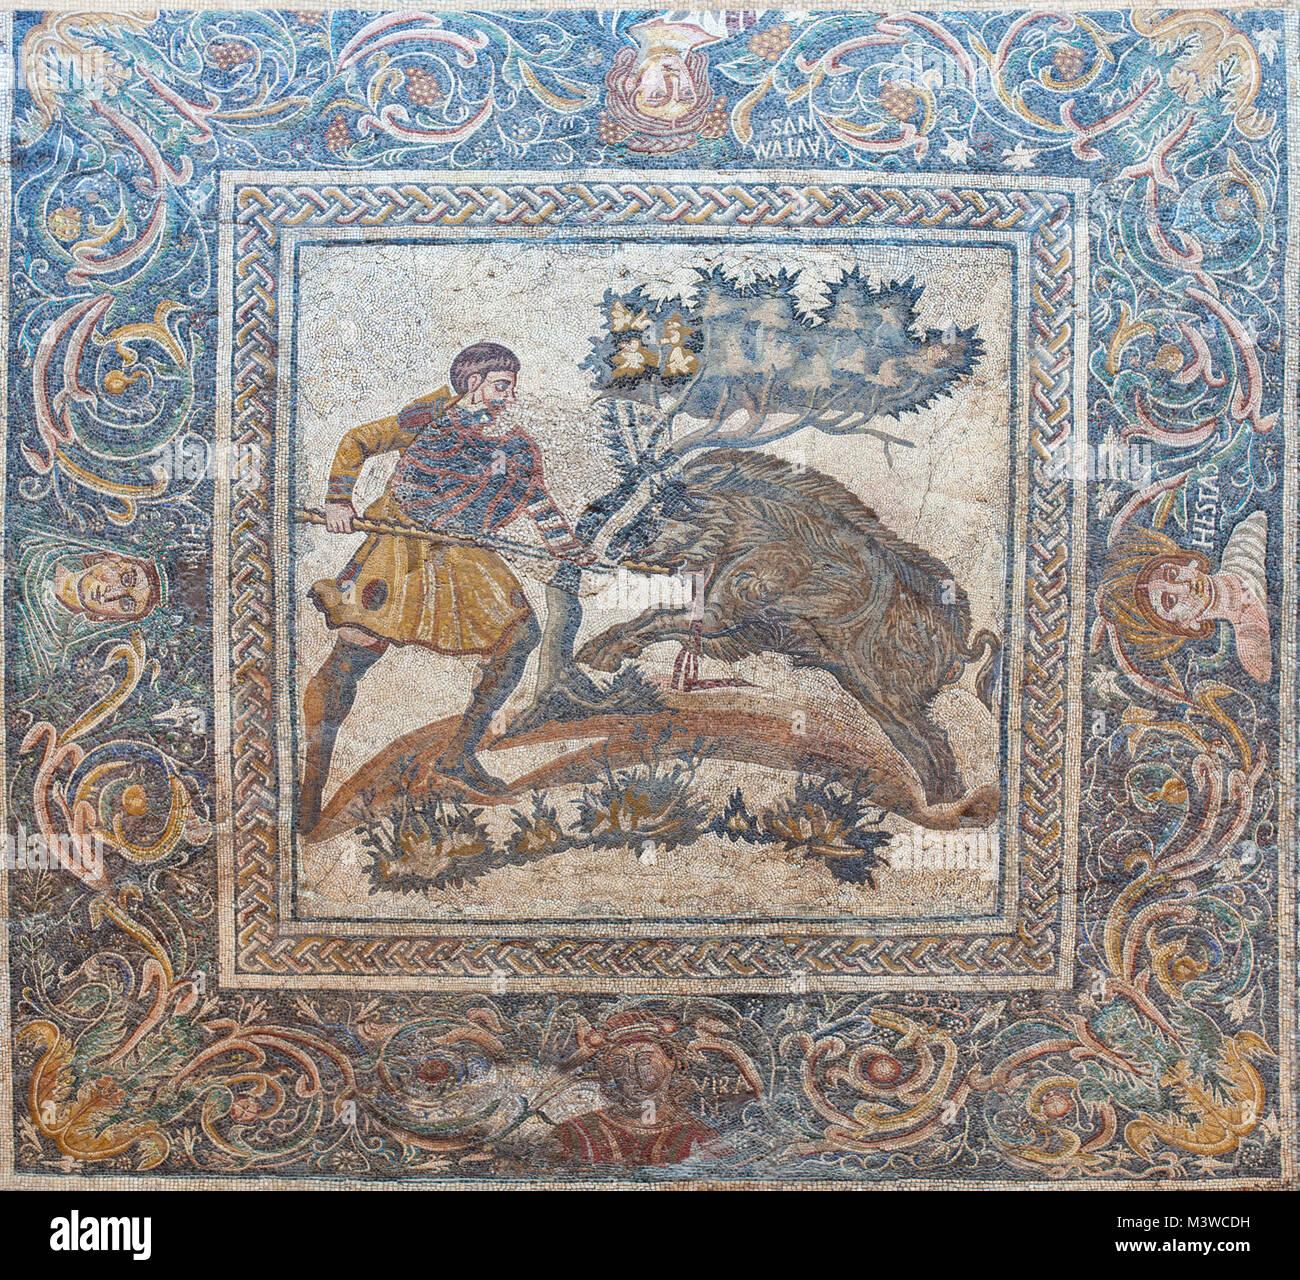 Merida, Spain - December 20th, 2017: Wild boar hunting mosaic. National Museum of Roman Art in Merida, Spain - Stock Image